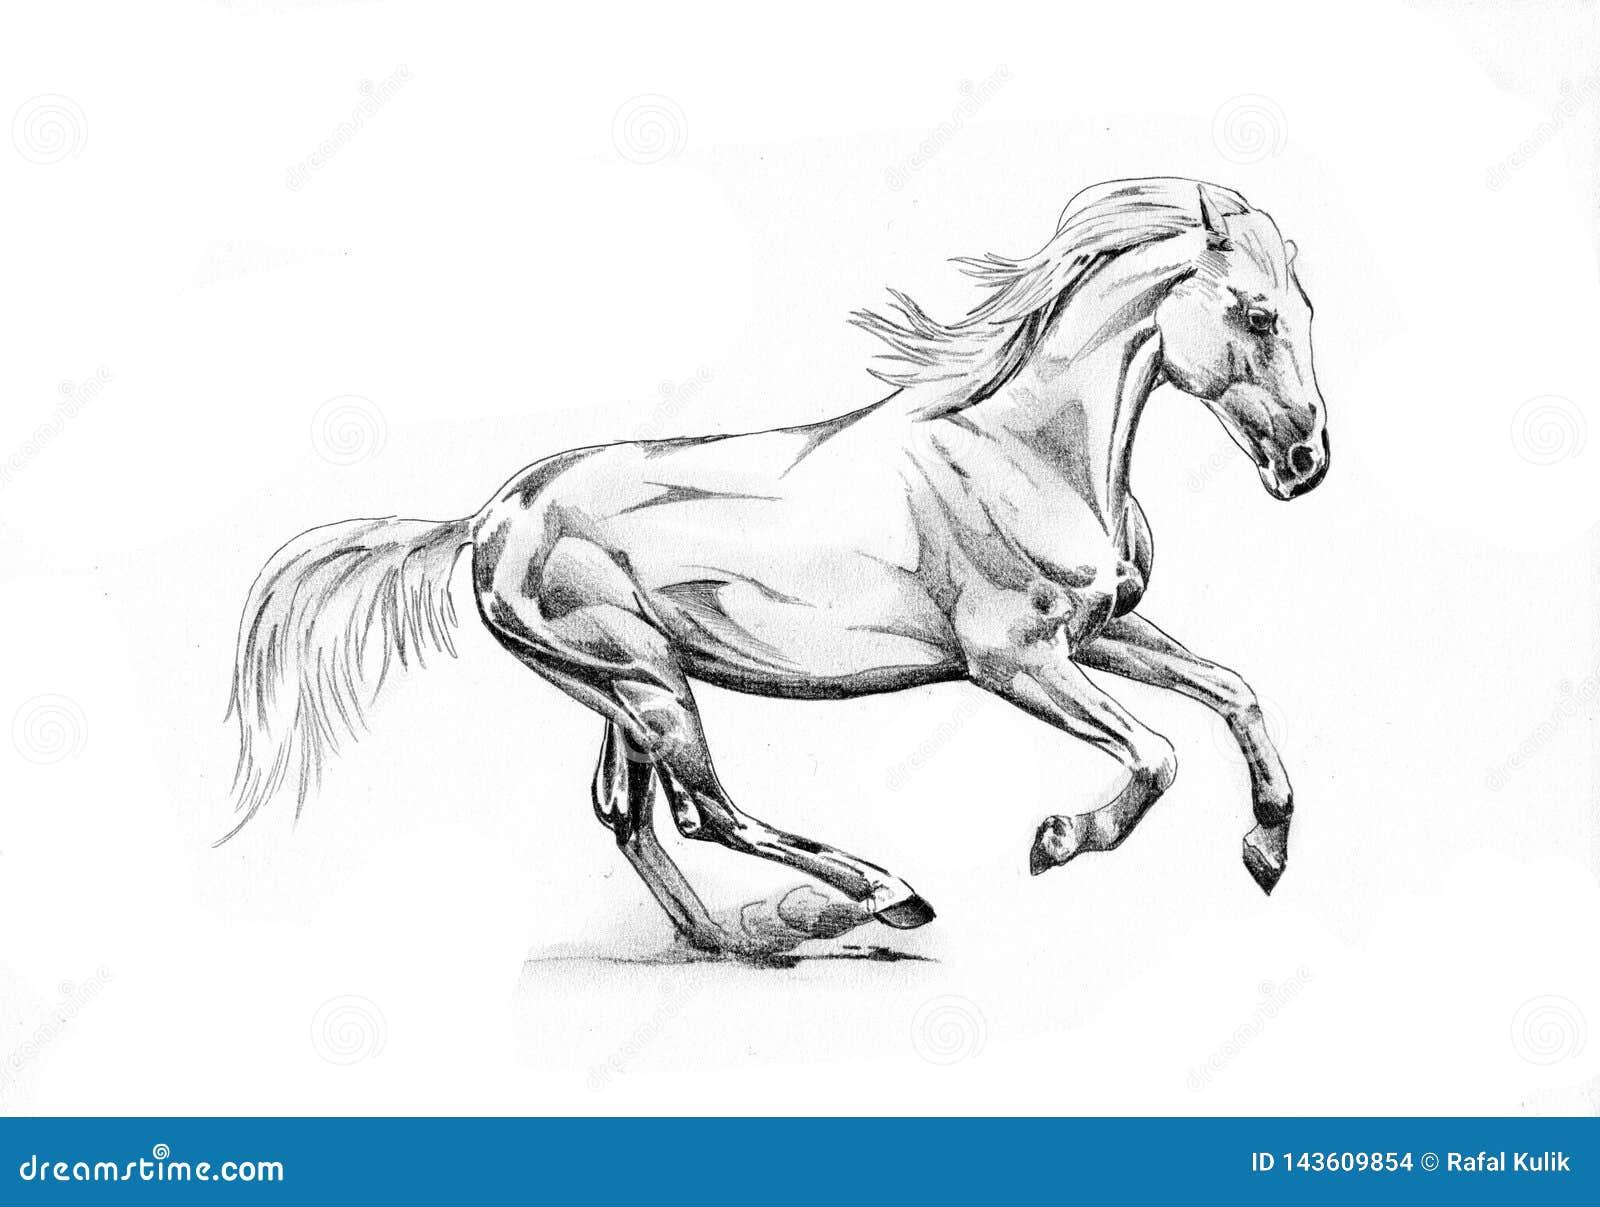 Freehand Horse Head Pencil Drawing Stock Illustration Illustration Of Mane Monochrome 143609854